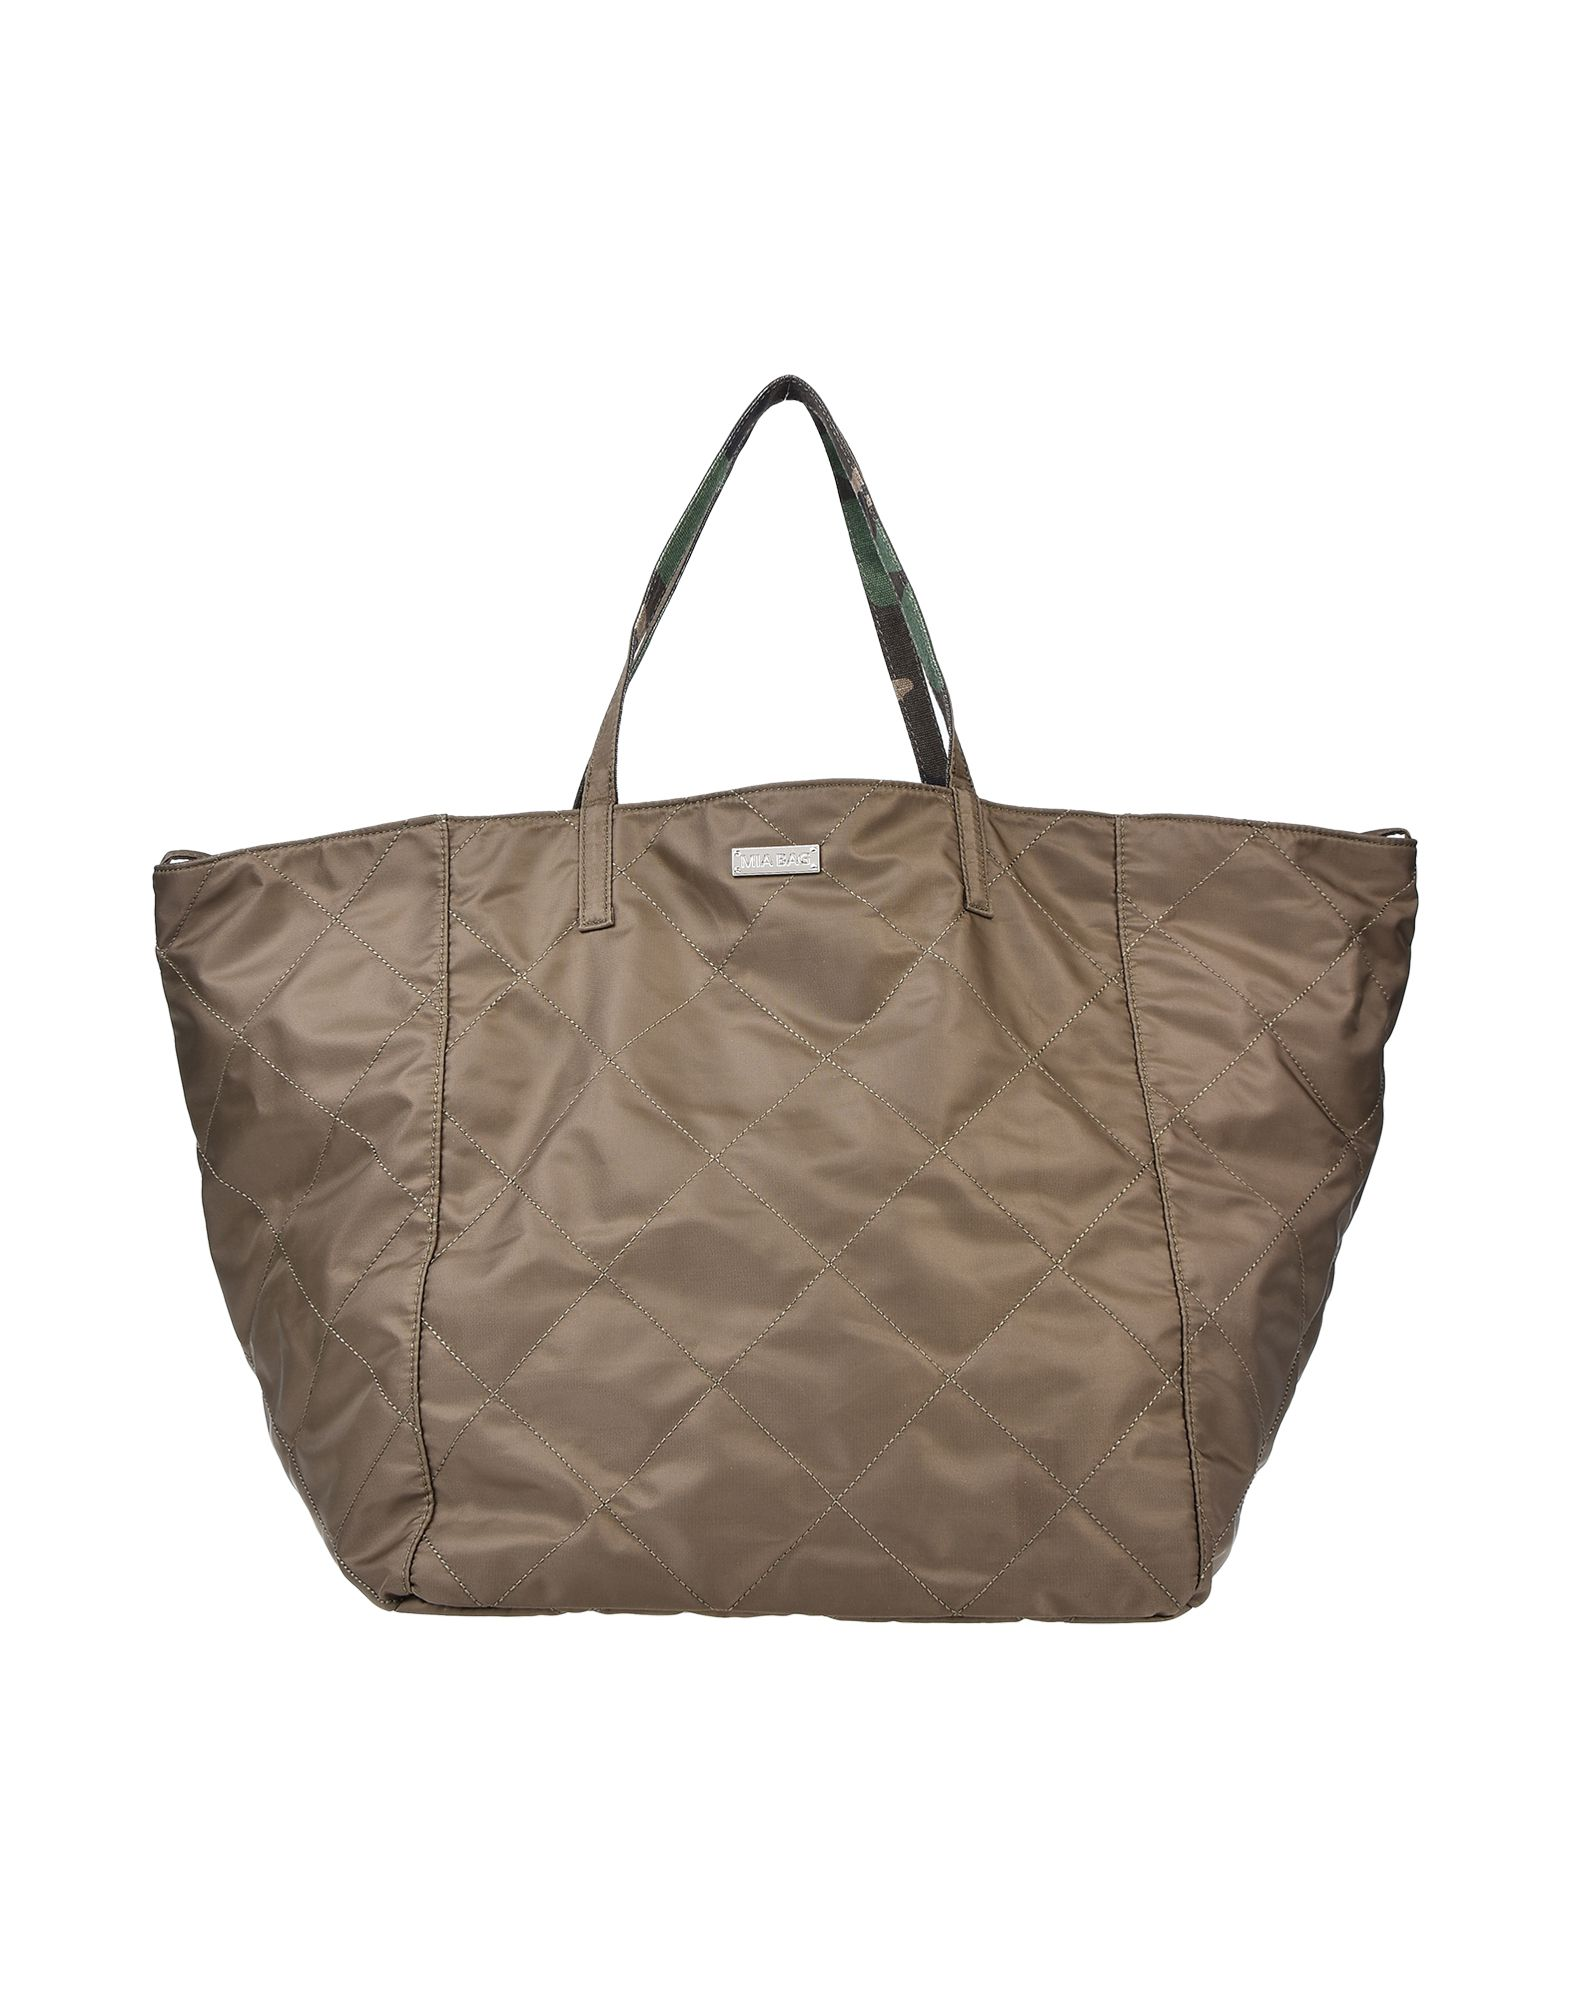 Фото - MIA BAG Сумка на руку 2017 luxury brand women handbag oil wax leather vintage casual tote large capacity shoulder bag big ladies messenger bag bolsa